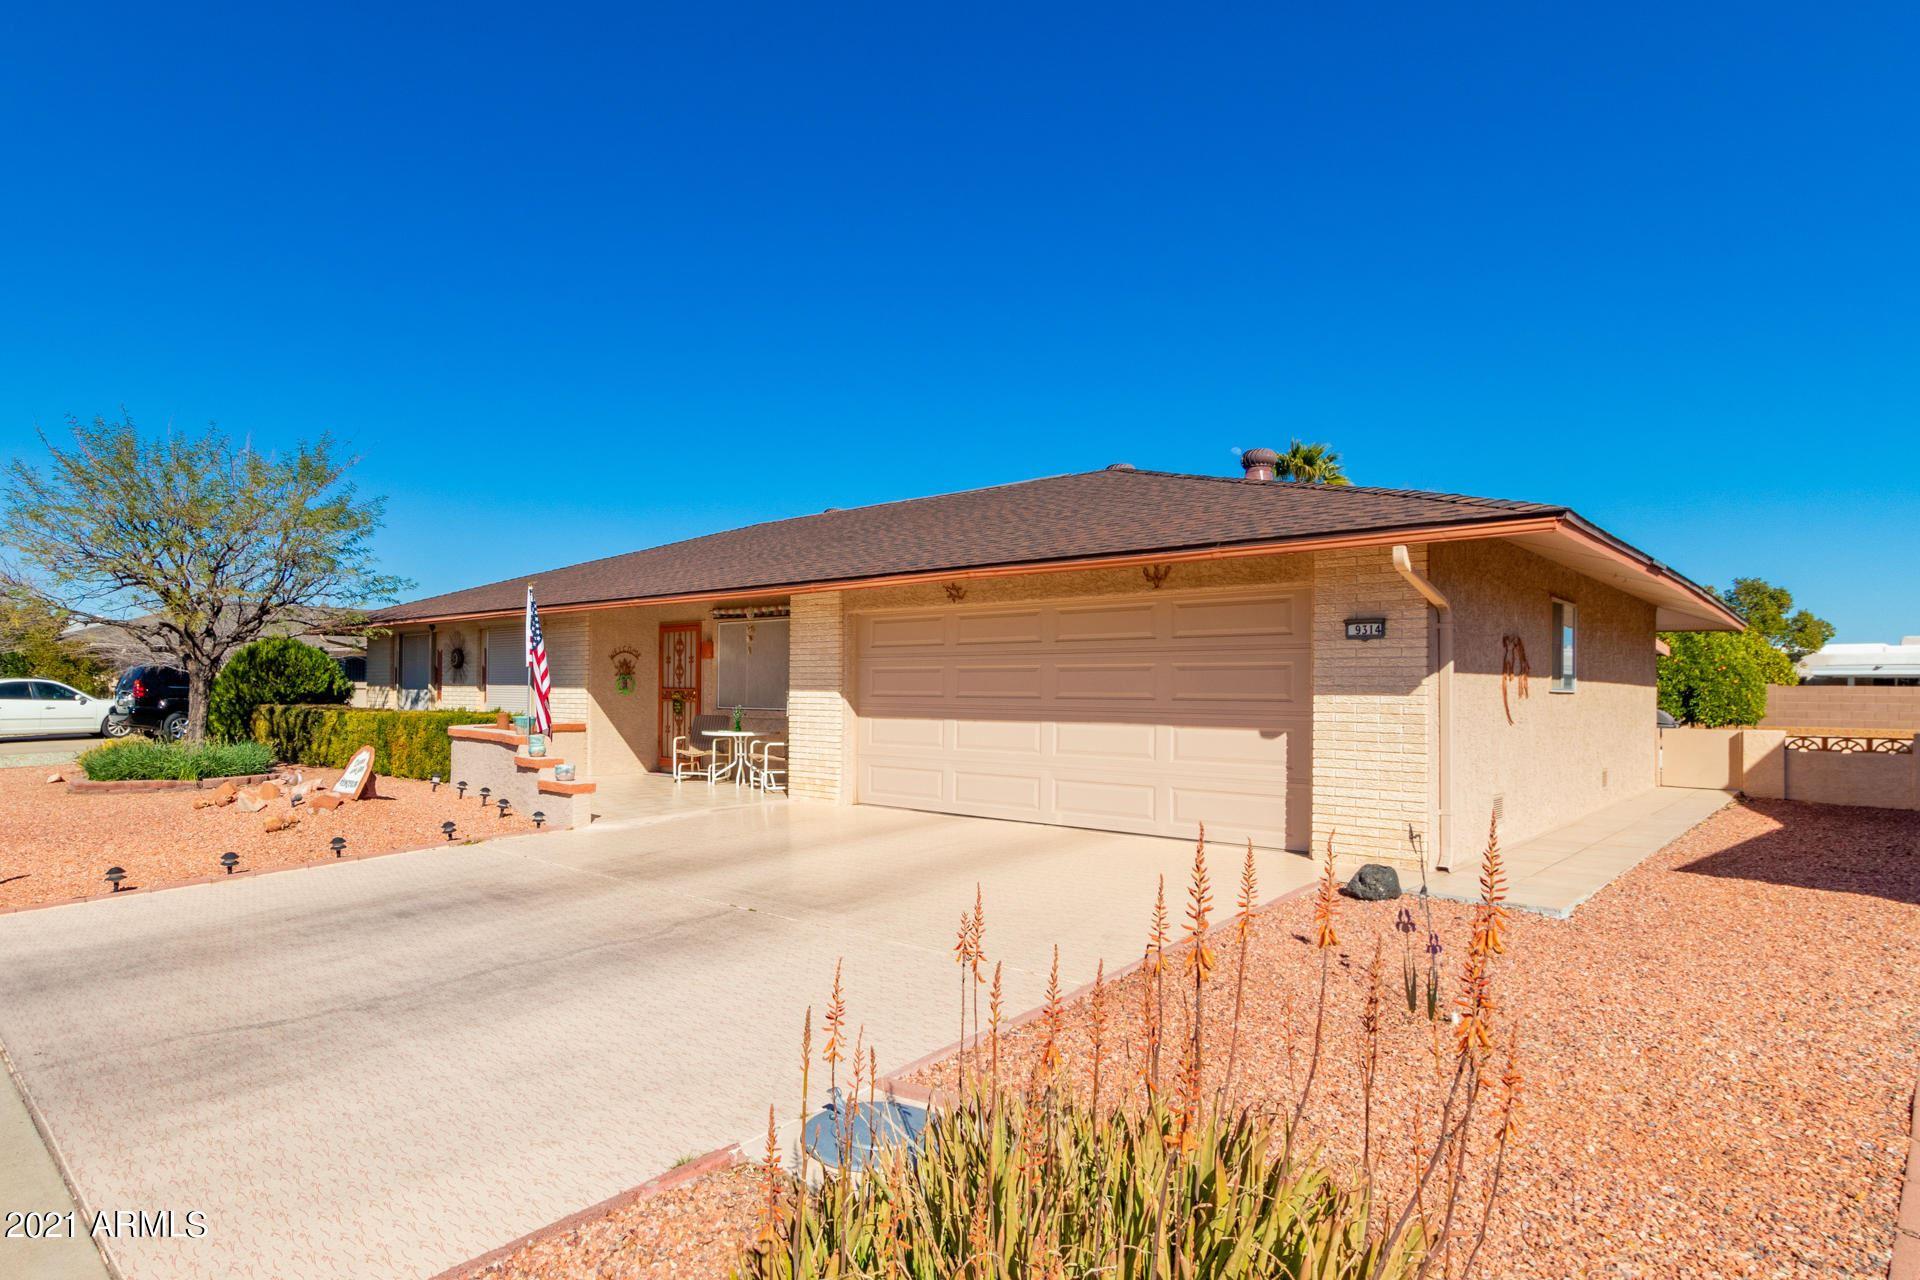 Photo of 9314 W HIDDEN VALLEY Circle N, Sun City, AZ 85351 (MLS # 6198493)